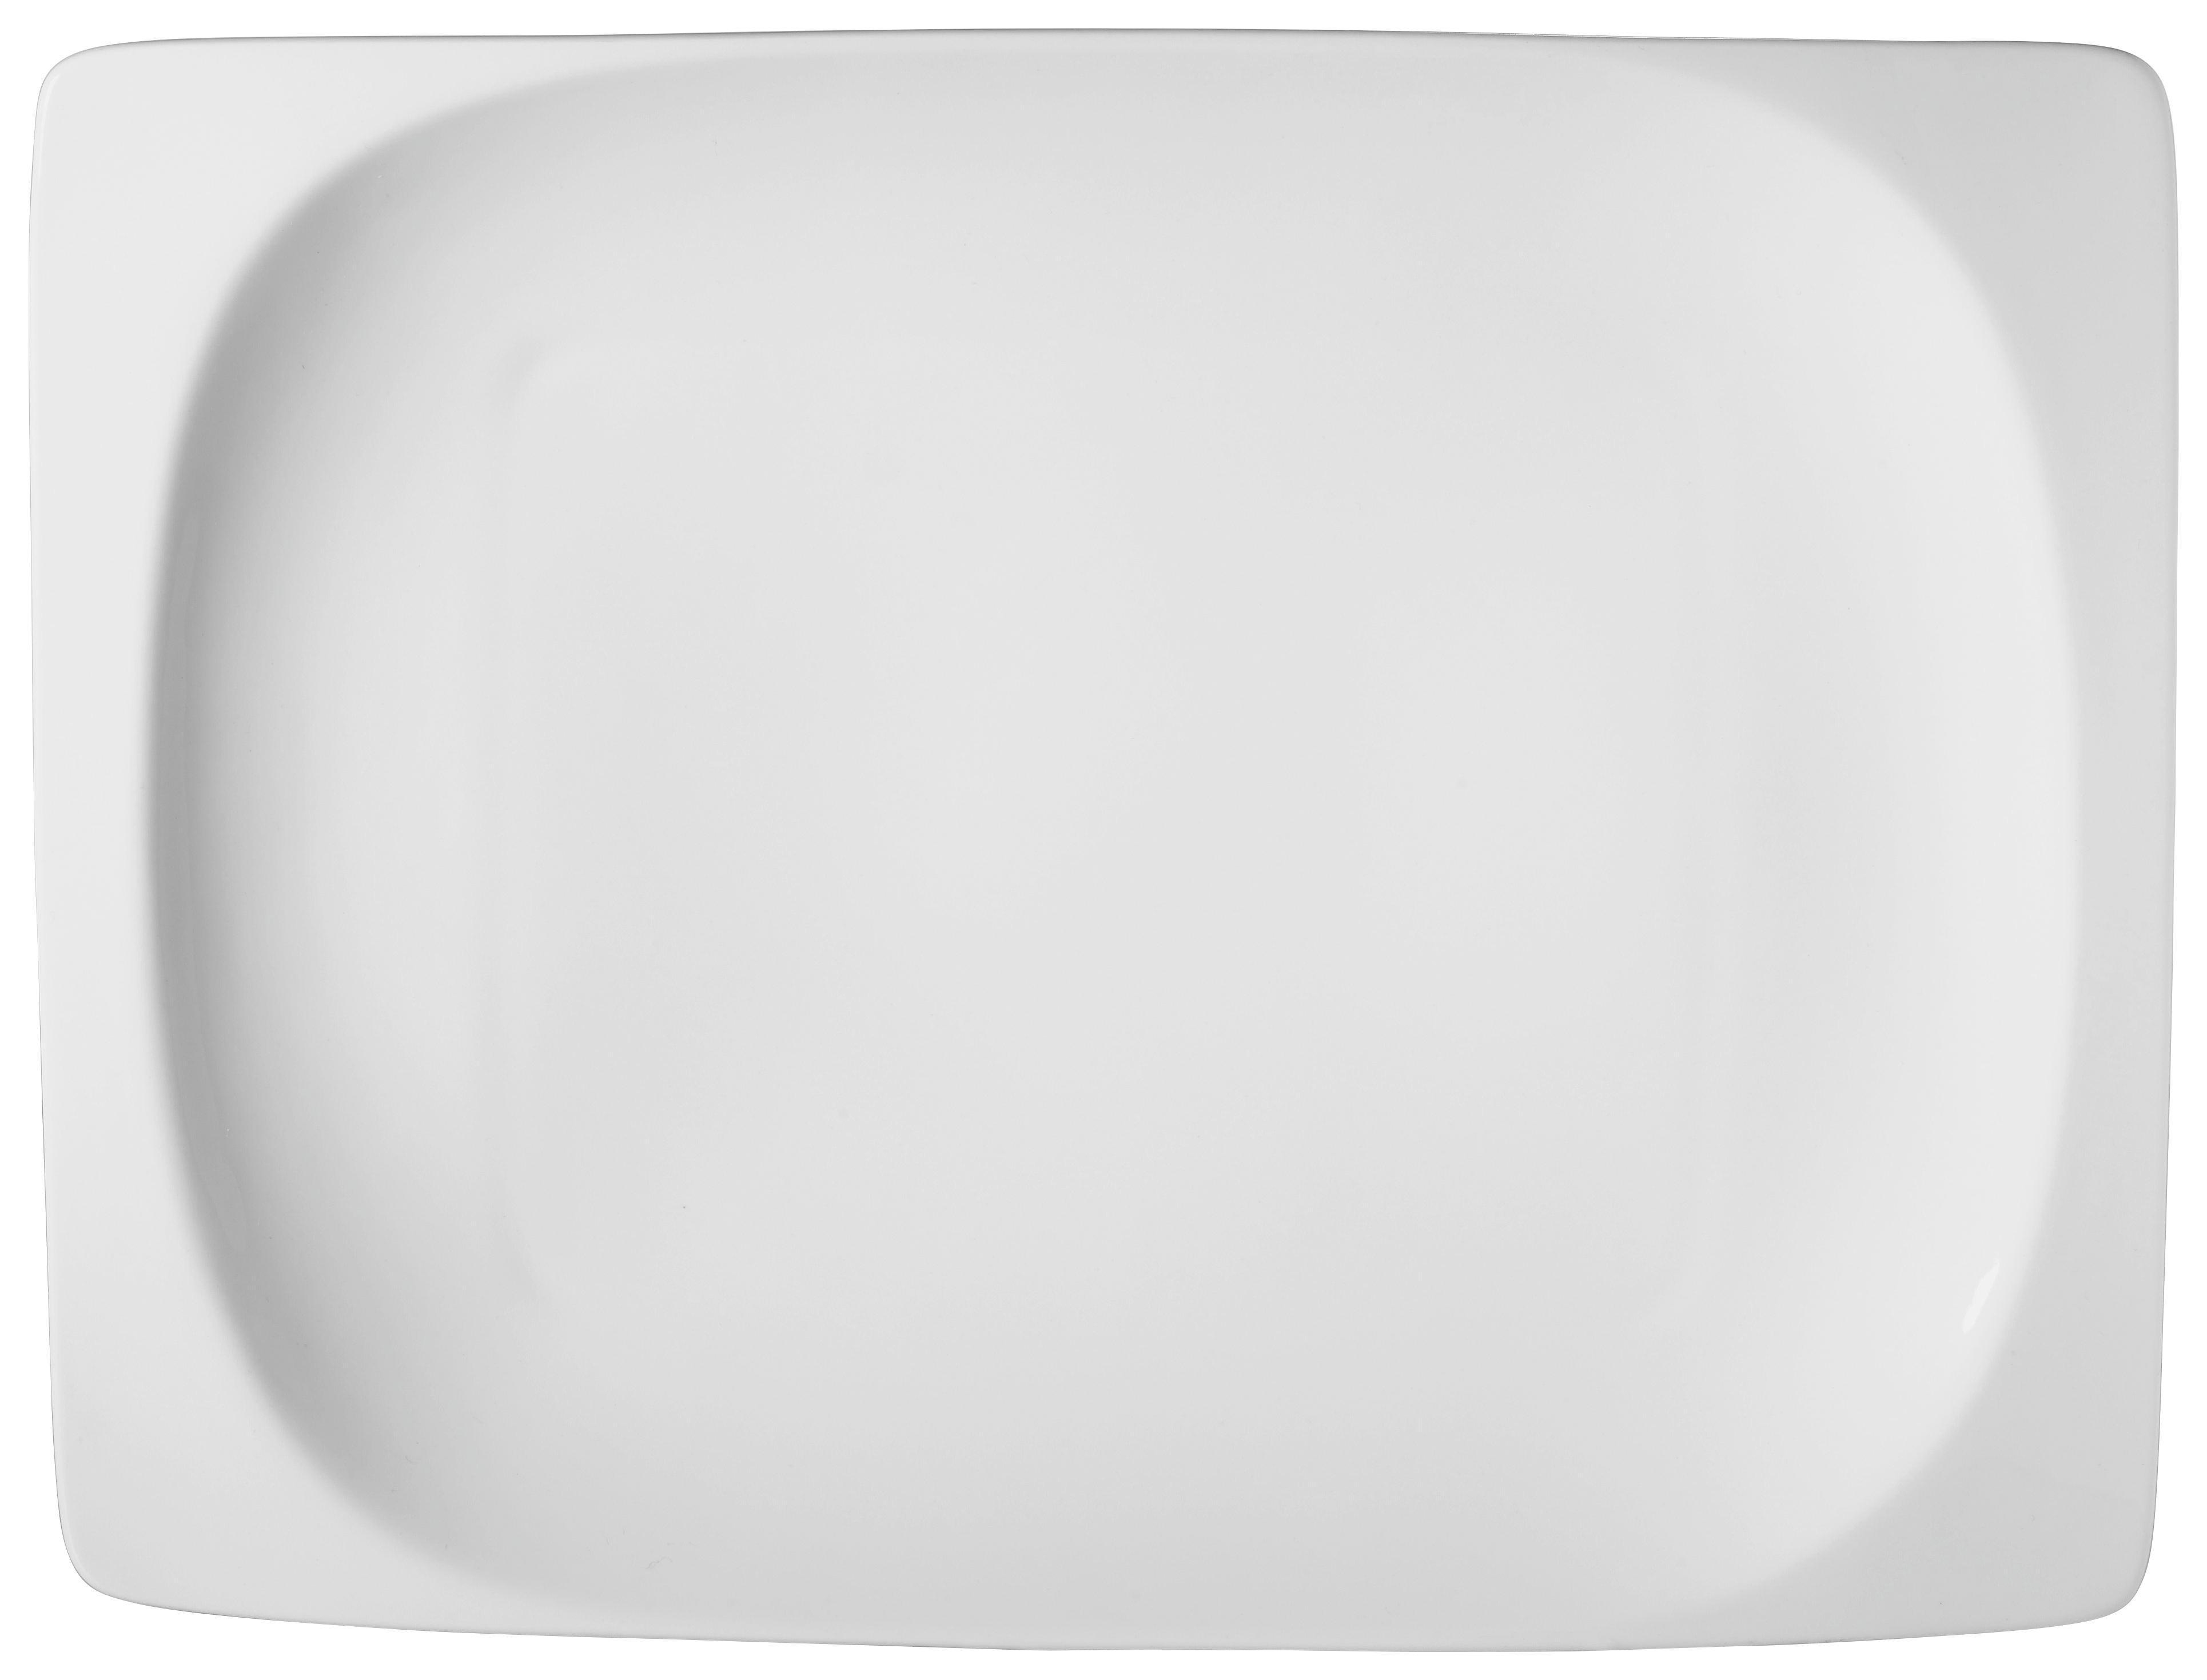 PLITVI KROŽNIK - bela, keramika (21,5/29,5/4cm) - RITZENHOFF BREKER